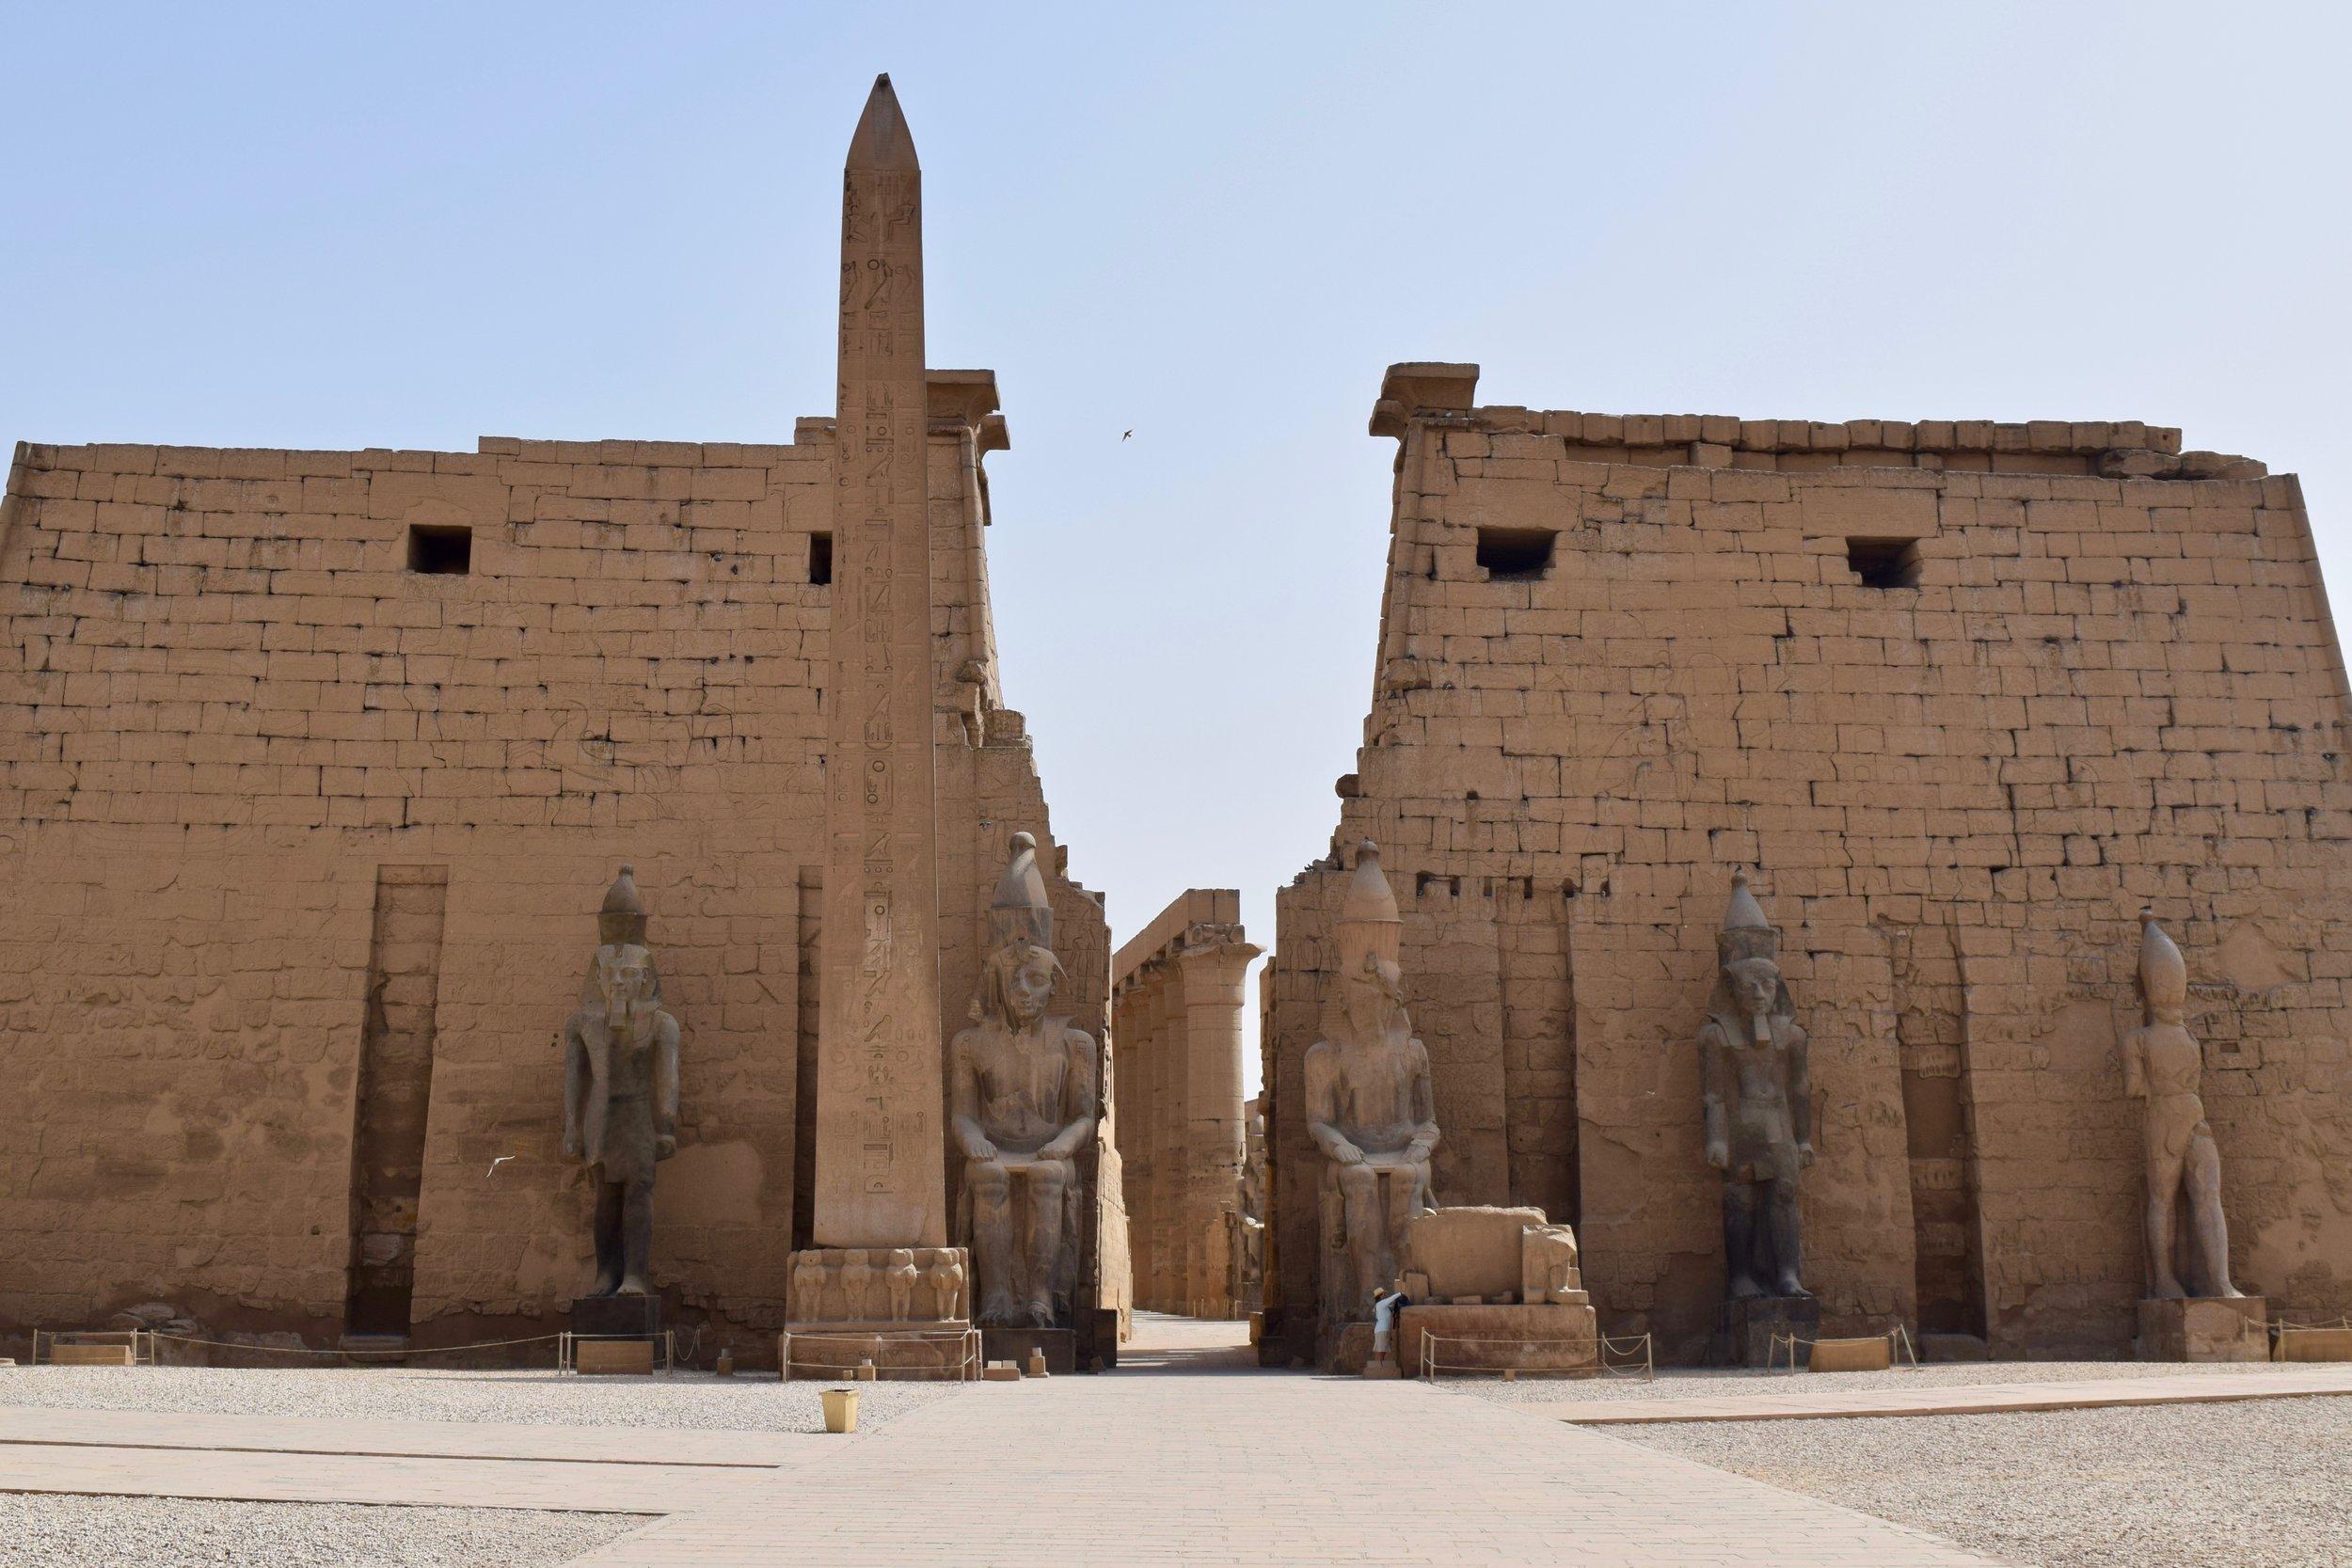 Pylon of Rameses II